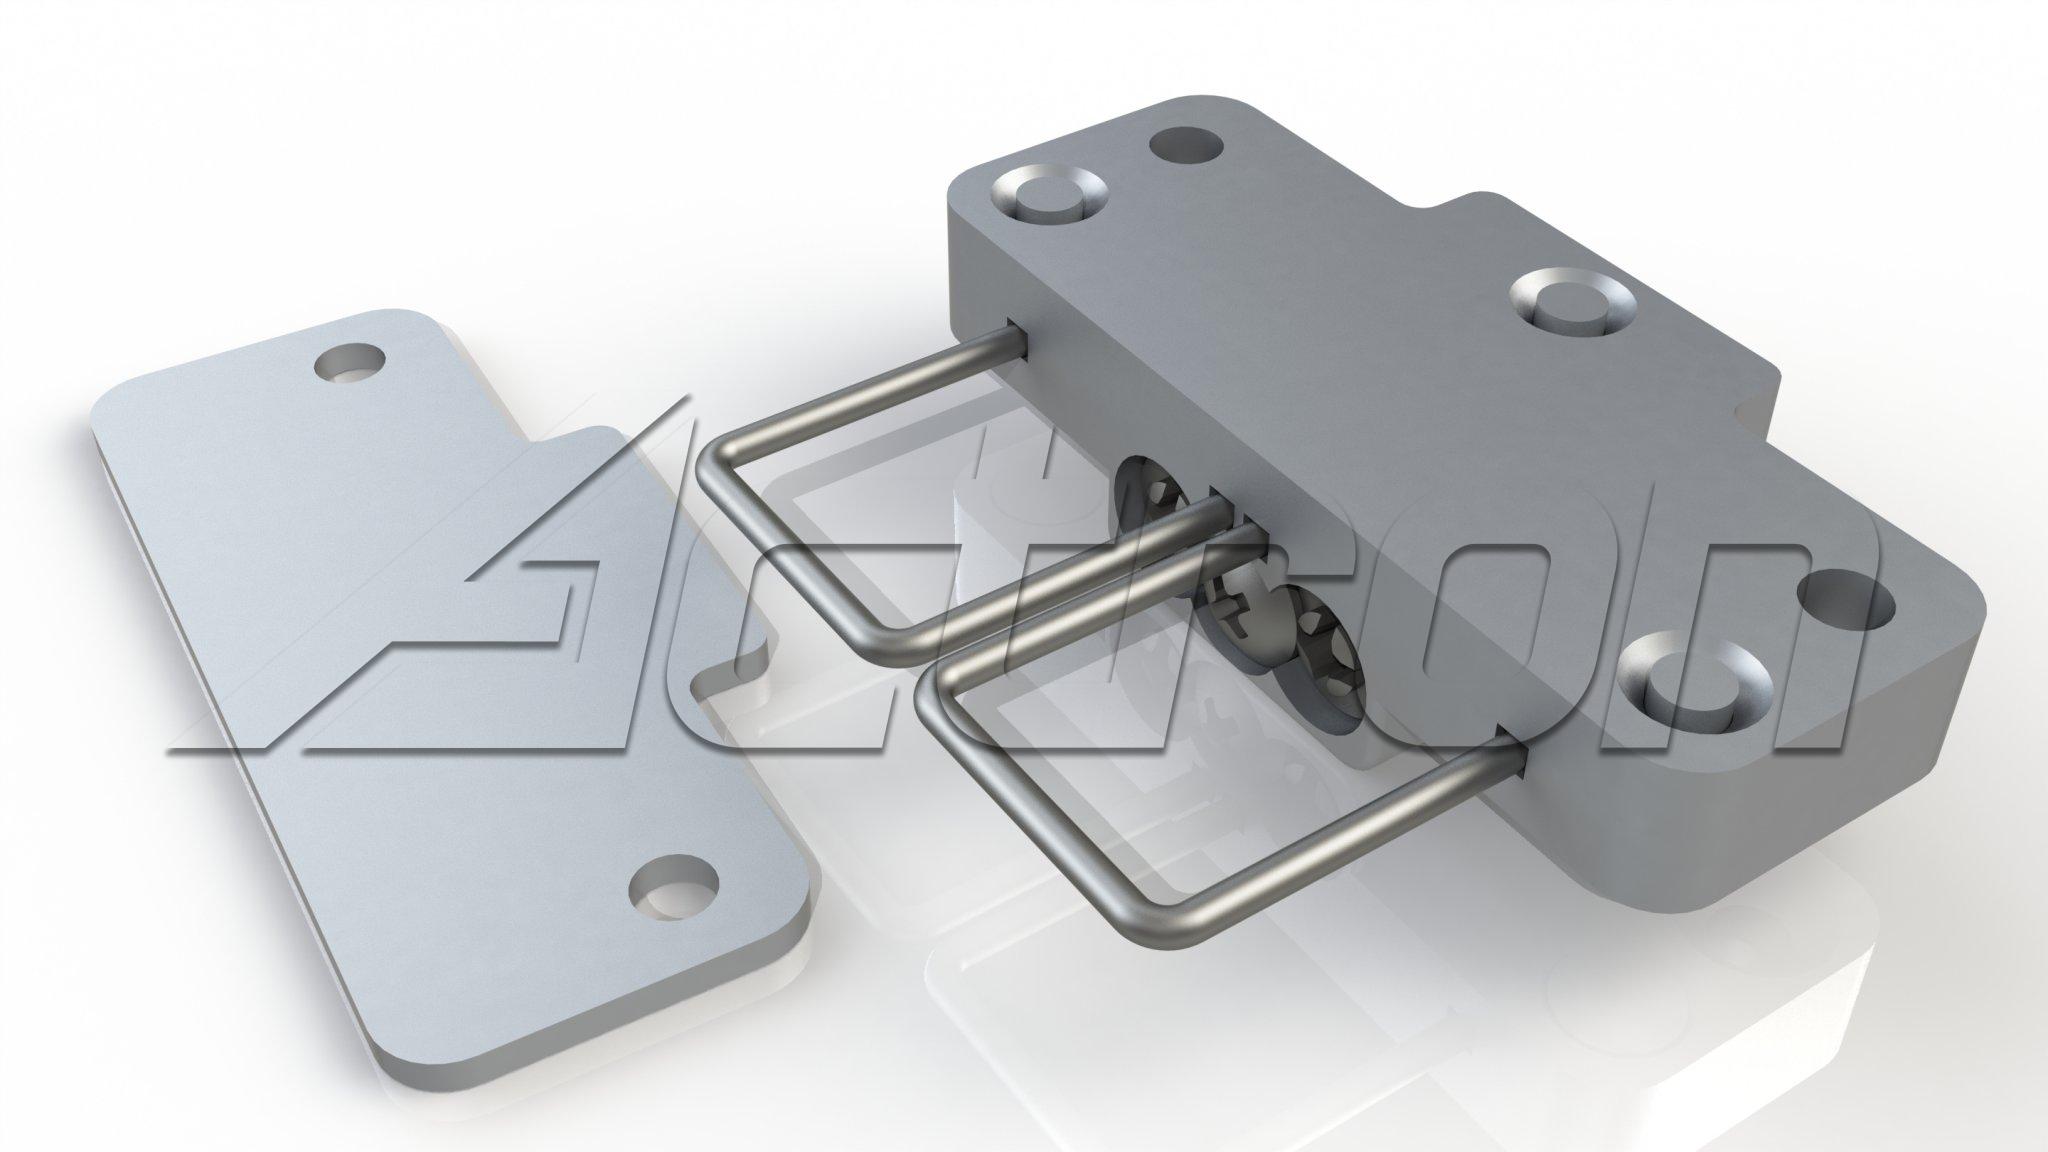 strike-assy-8211-dual-wire-adjustable-5569-a32107.jpg